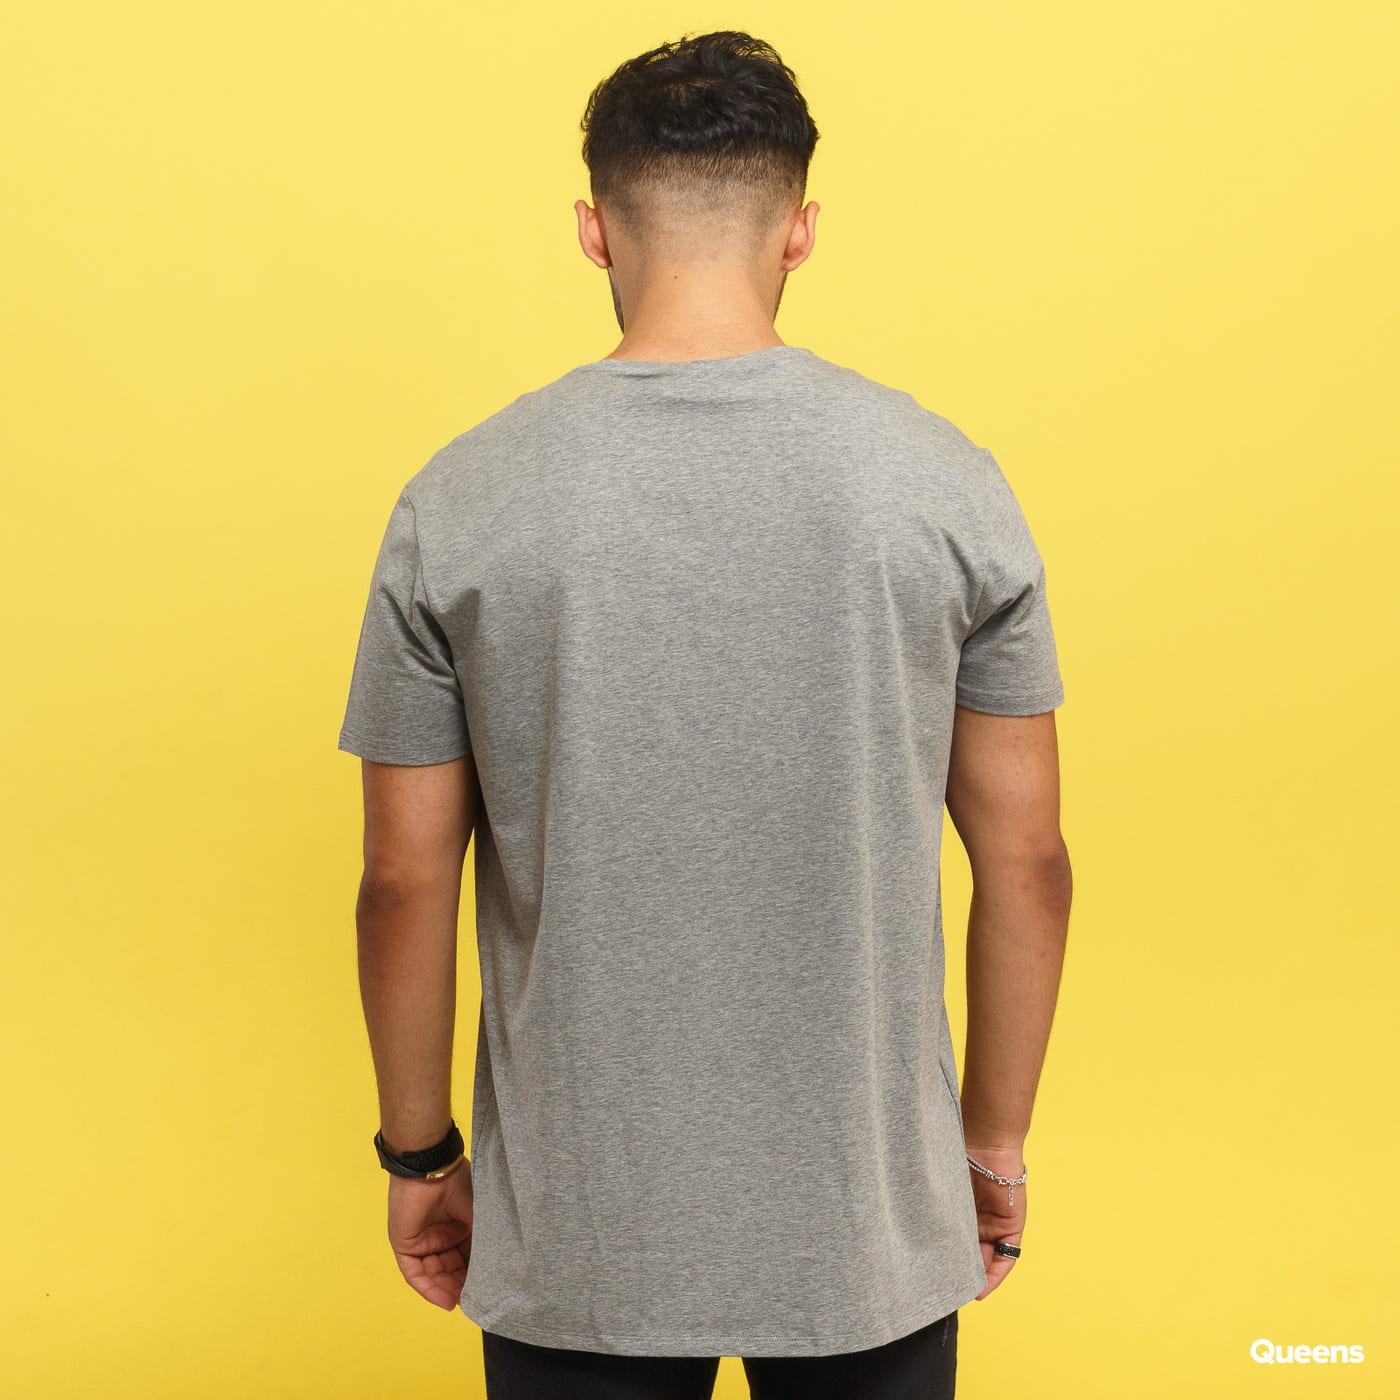 LACOSTE Base T-shirt grau melange